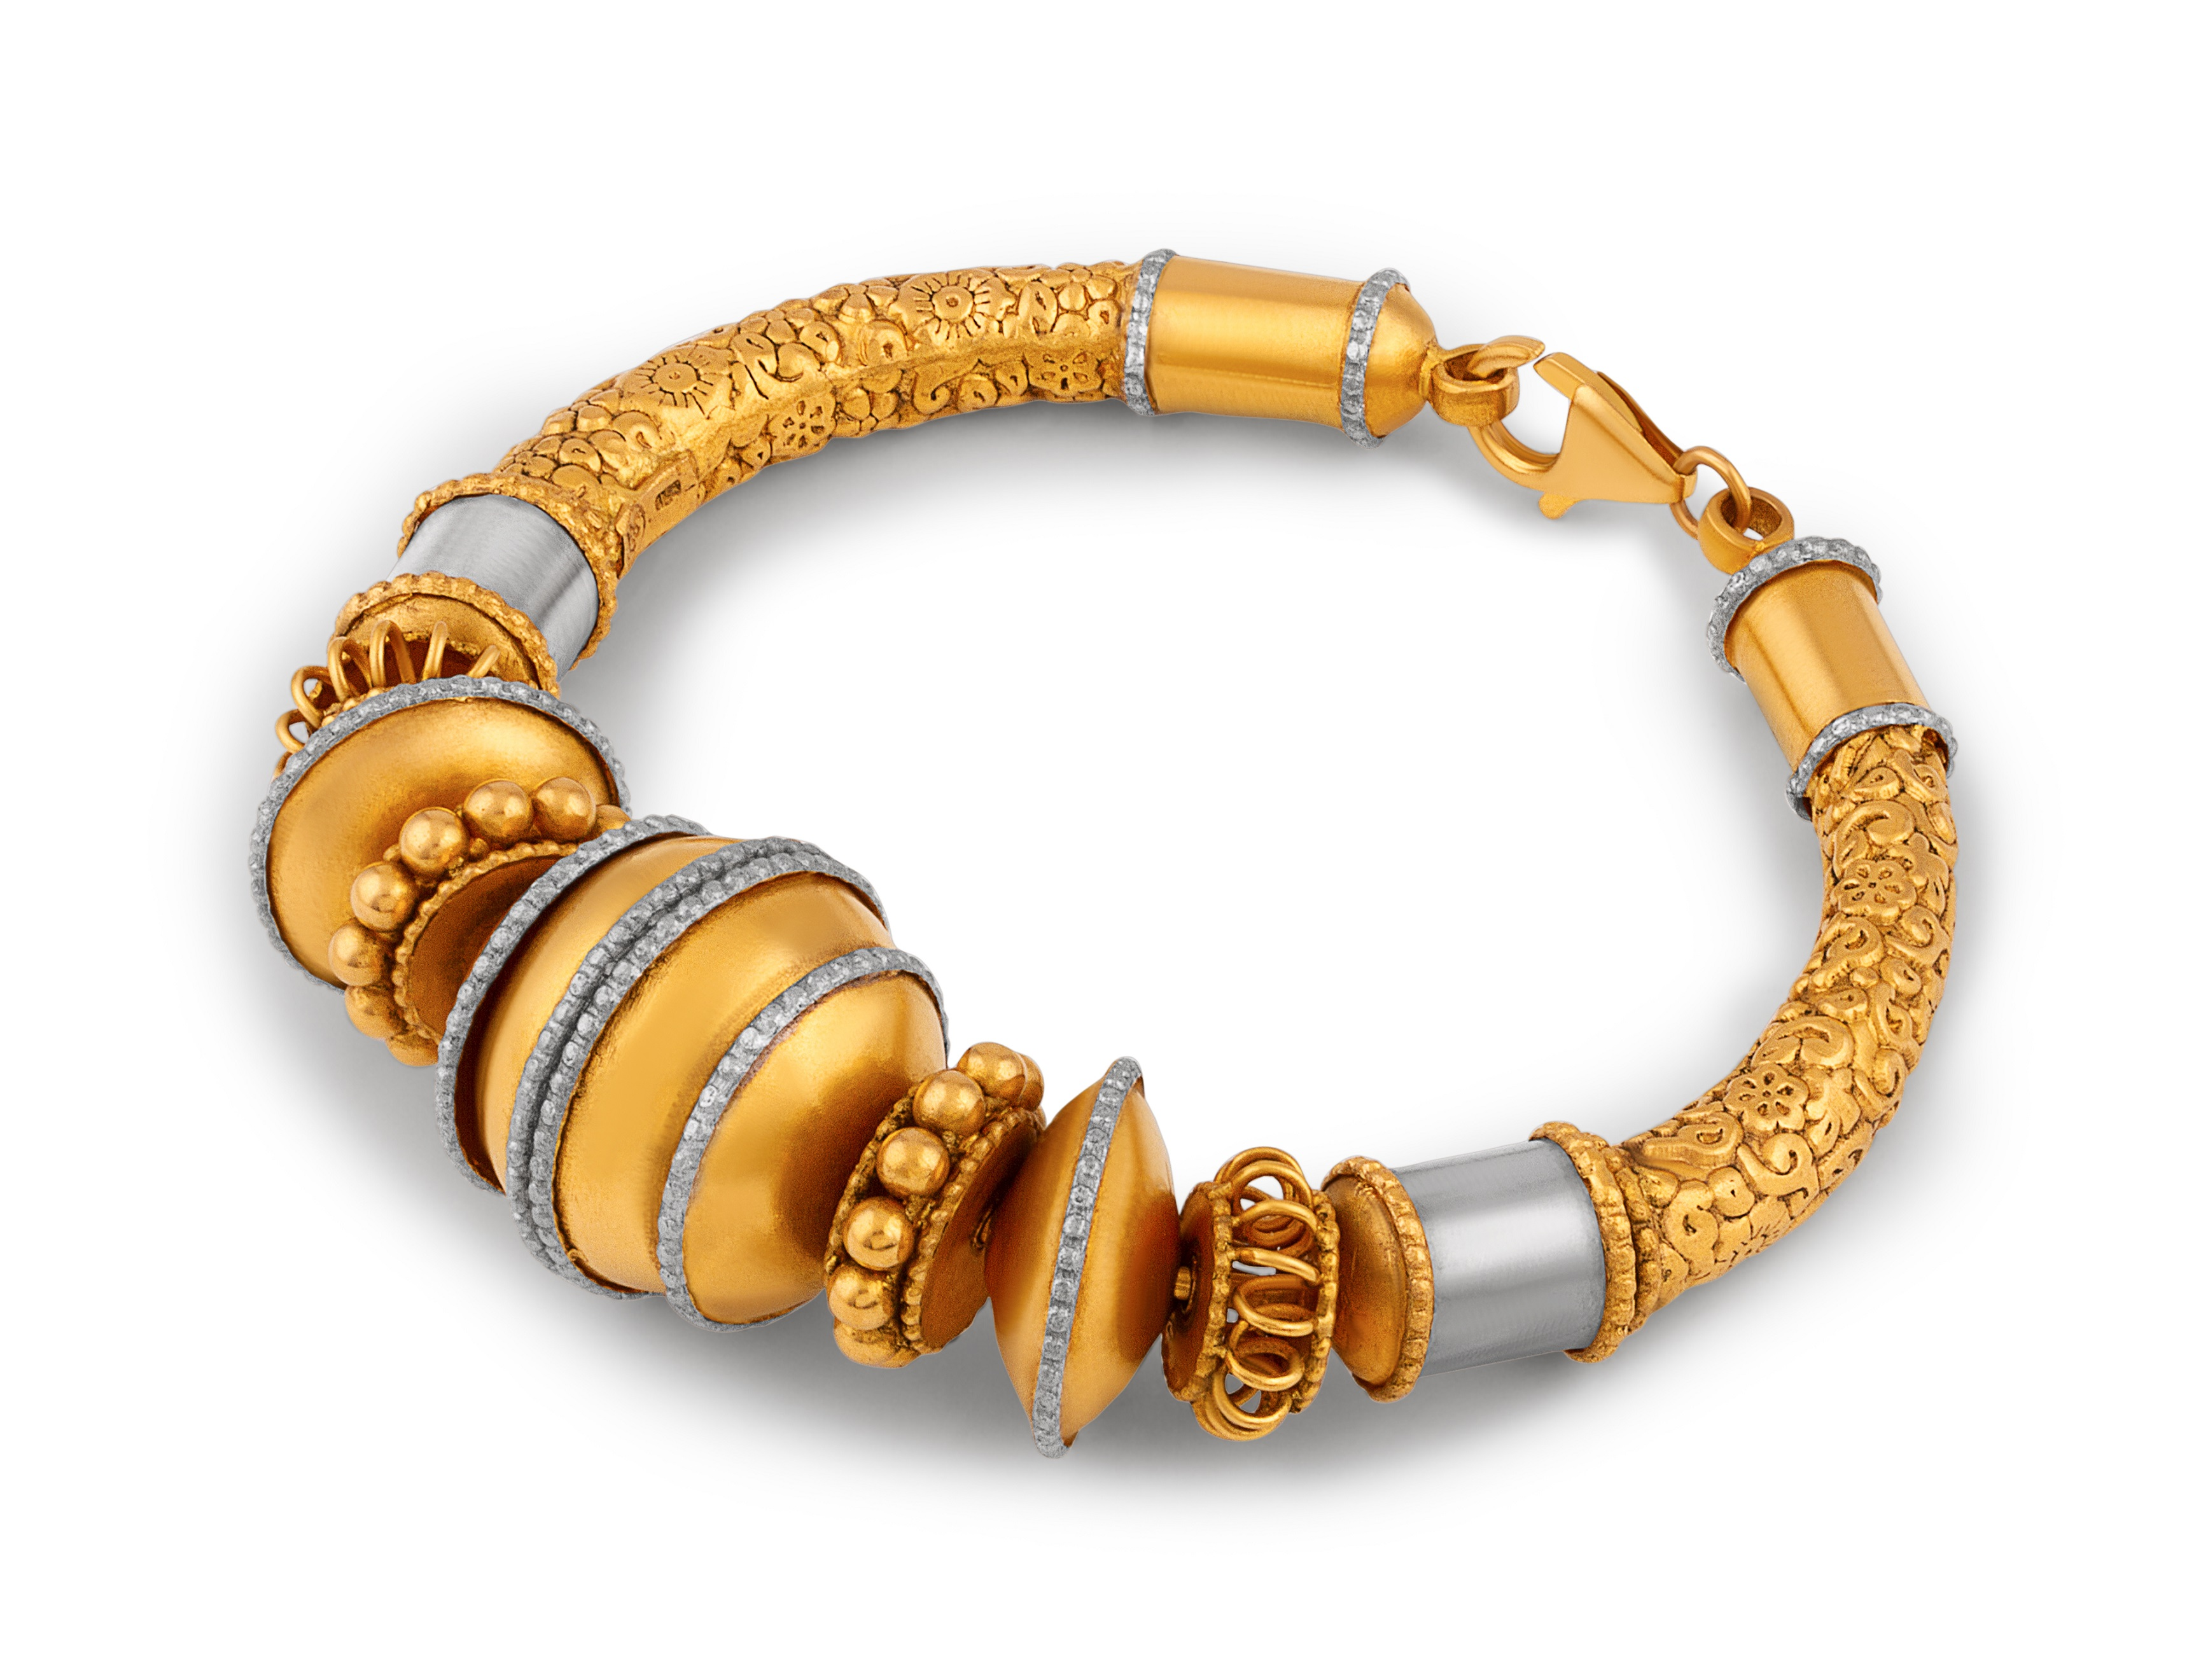 Gold Kadha by TBZ - The Original